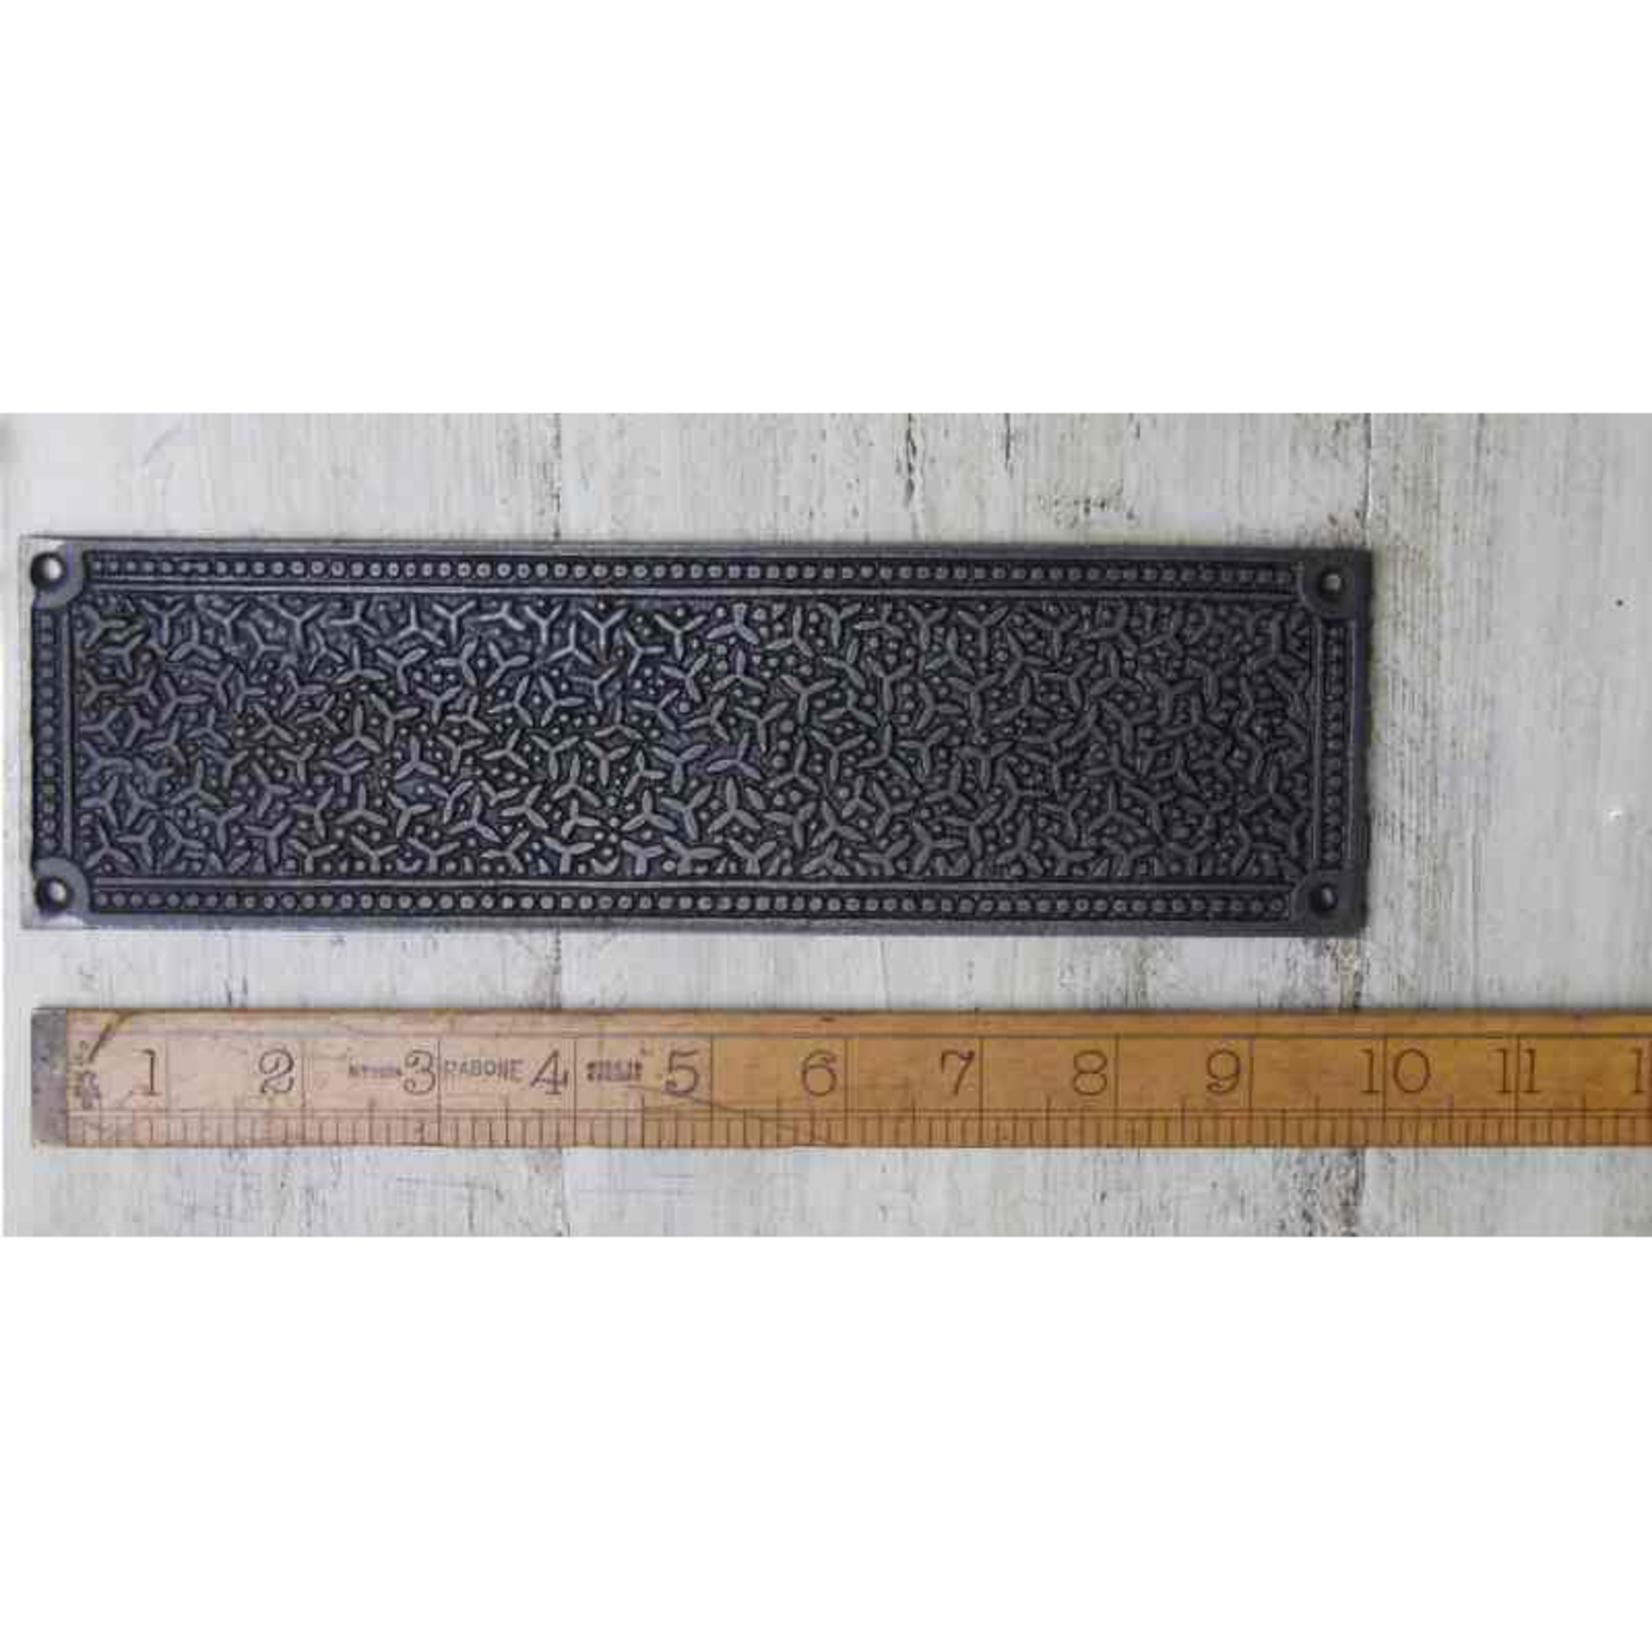 IRON RANGE Decorative Ornate Push Plate Iron